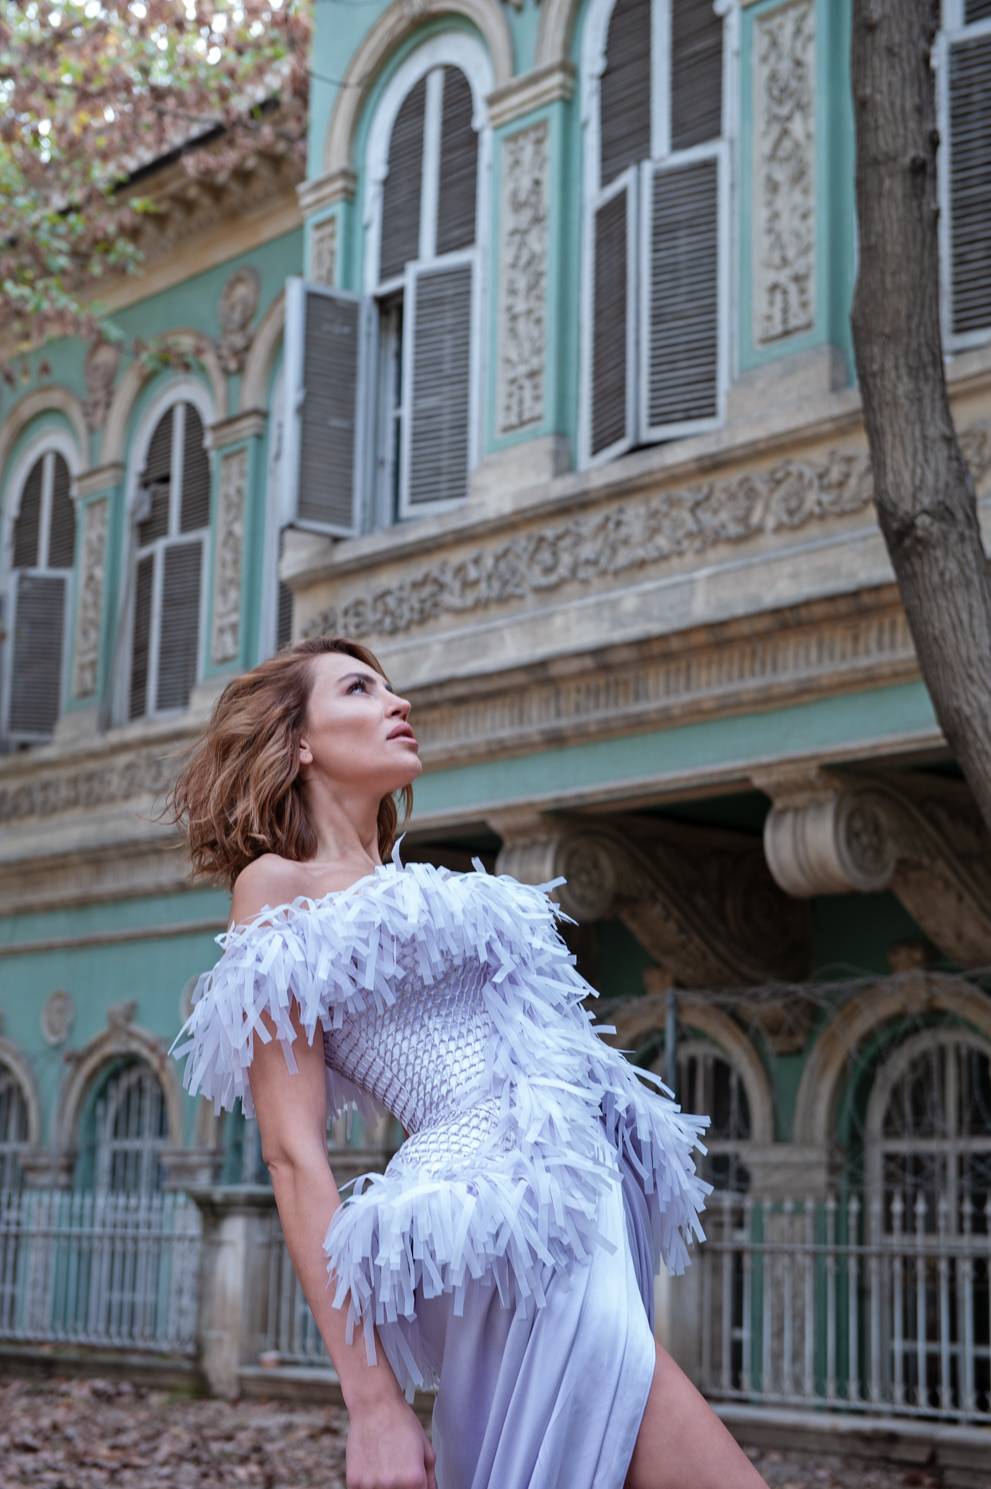 Guynay Musayeva for Afffair in Istanbul, Turkey by Farnham, Surrey based portrait and fashion photographer